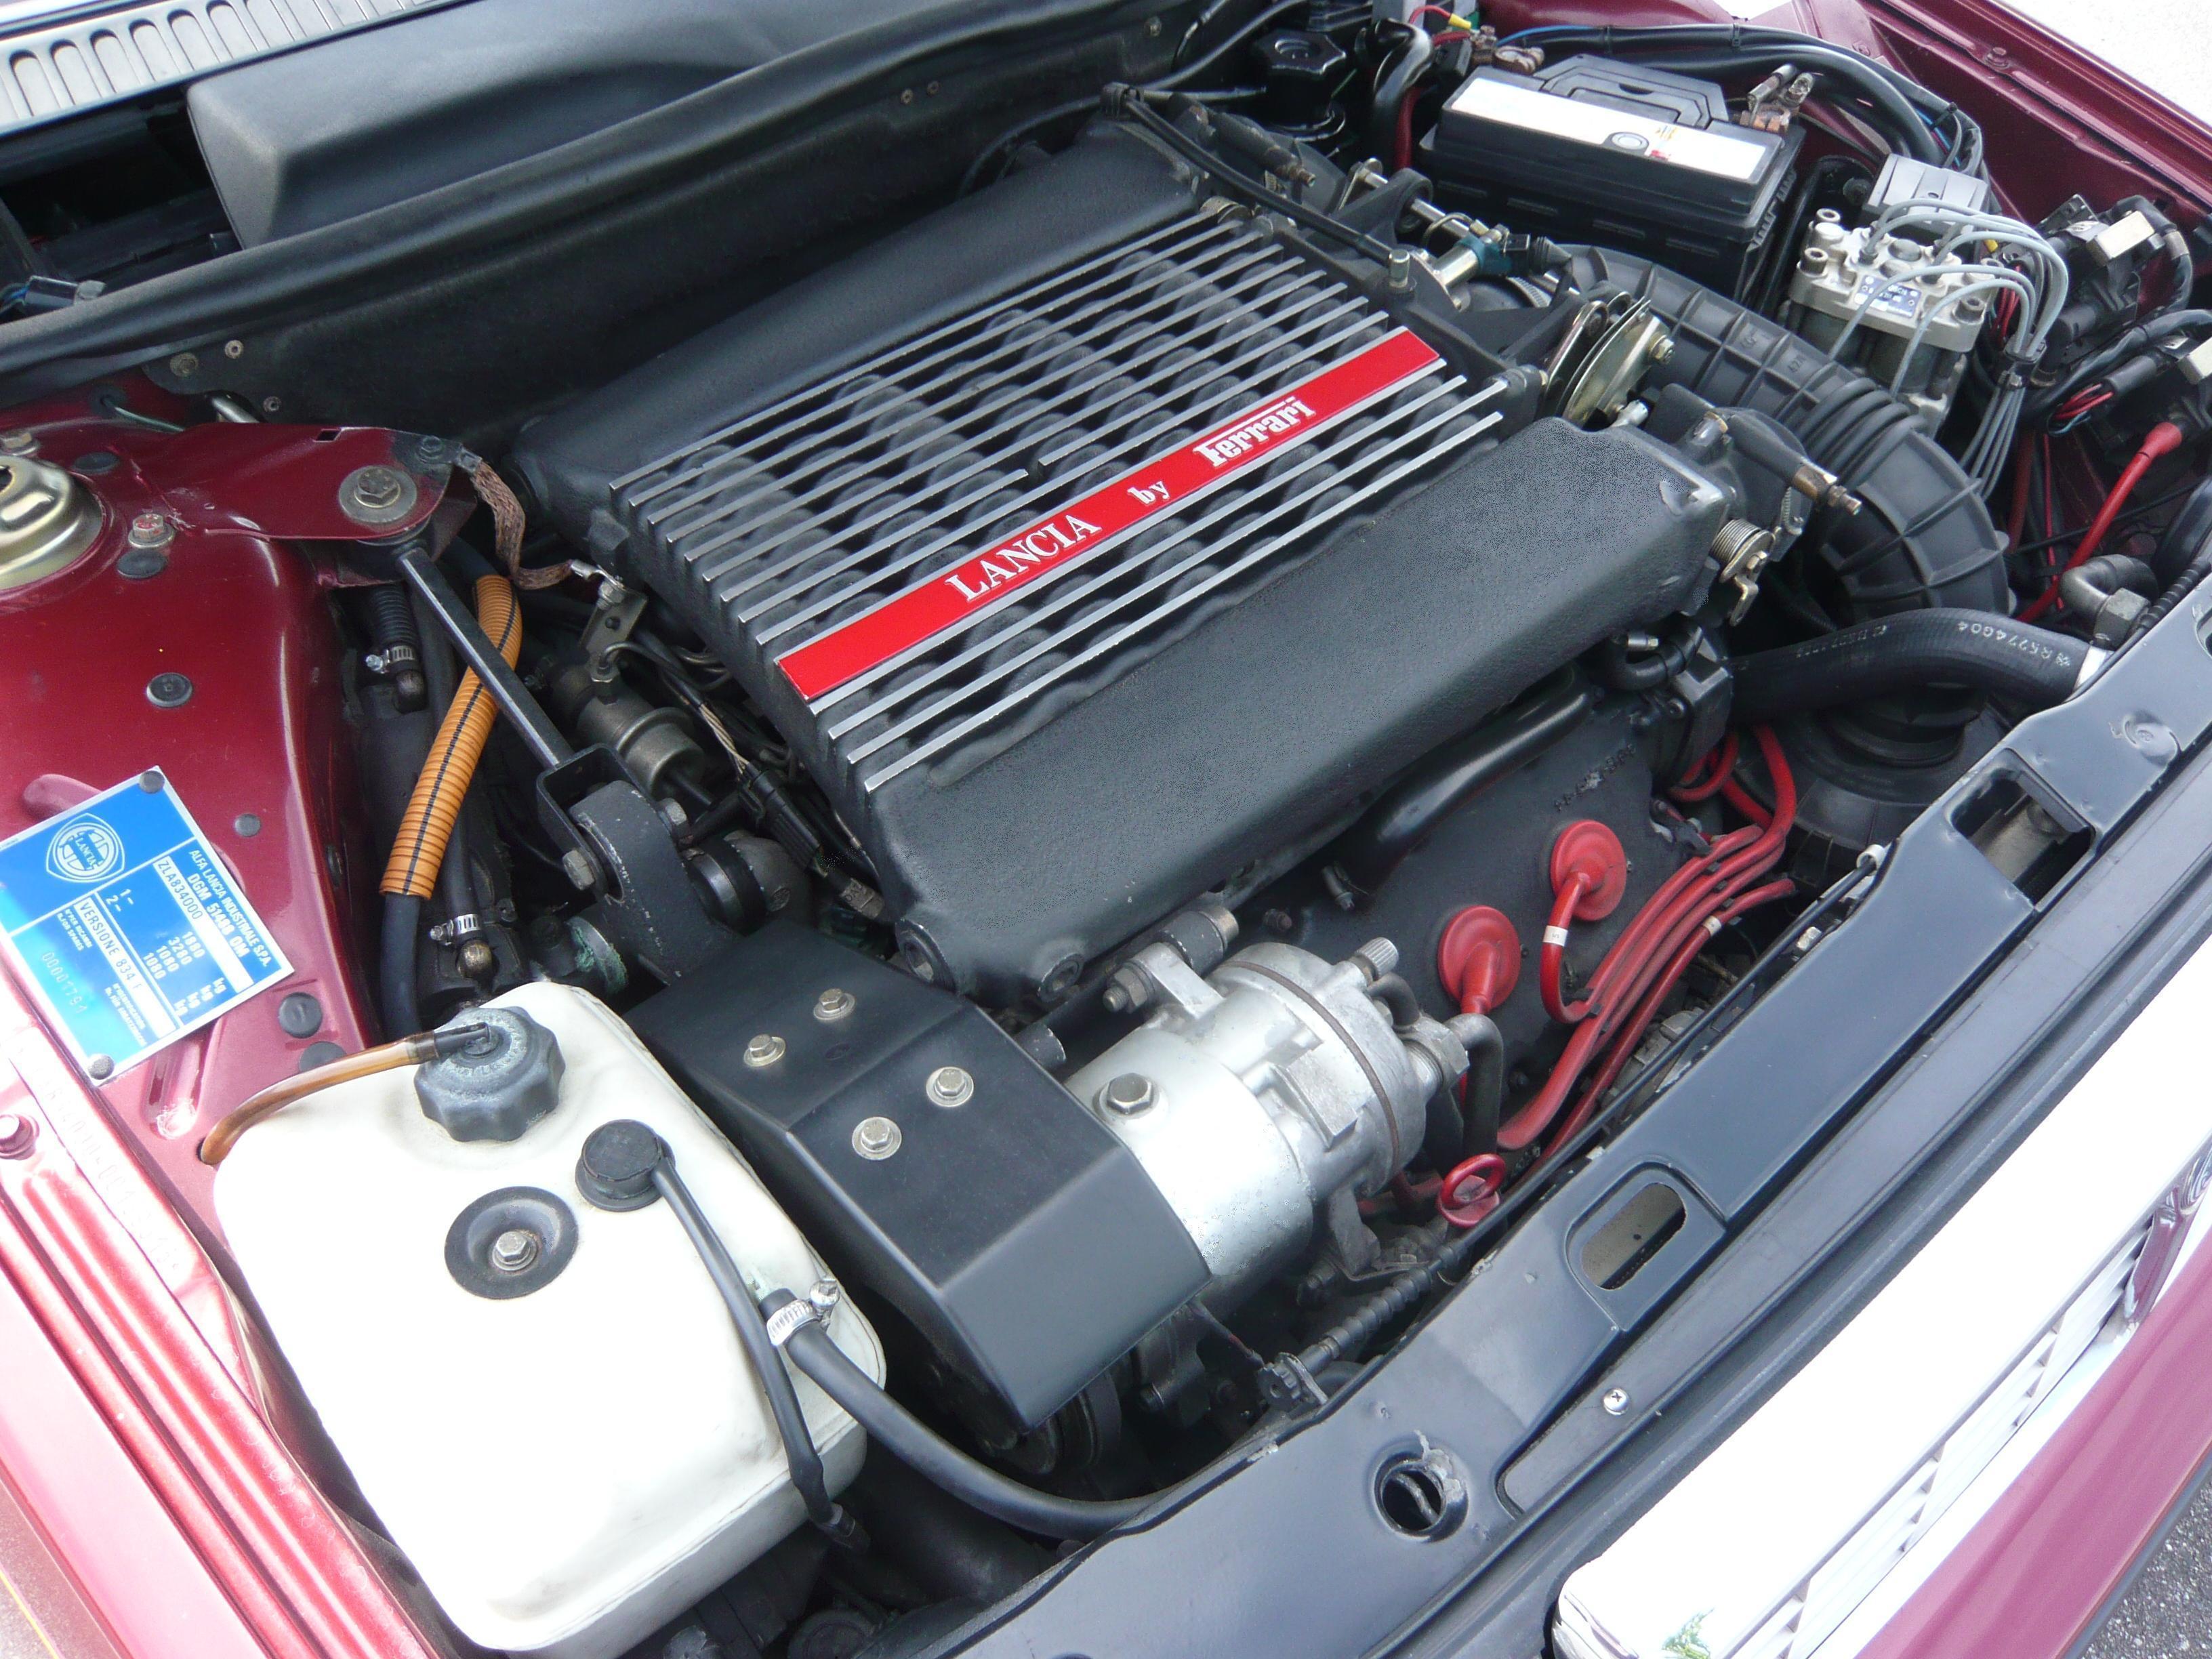 File:Lancia thema 8.32 Lancia by Ferrari.jpg - Wikimedia Commons